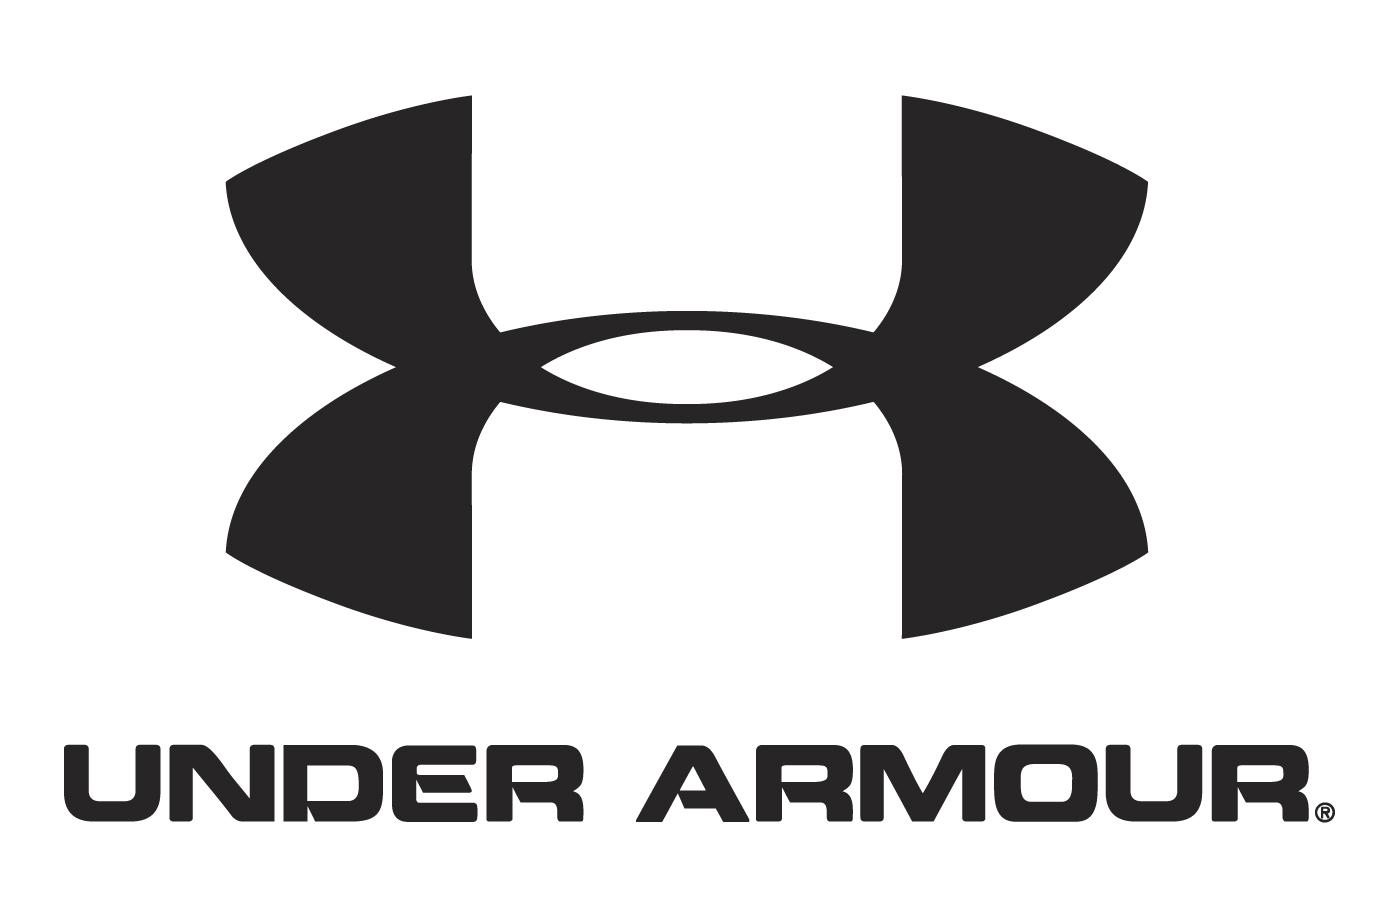 Under armour basketball clipart